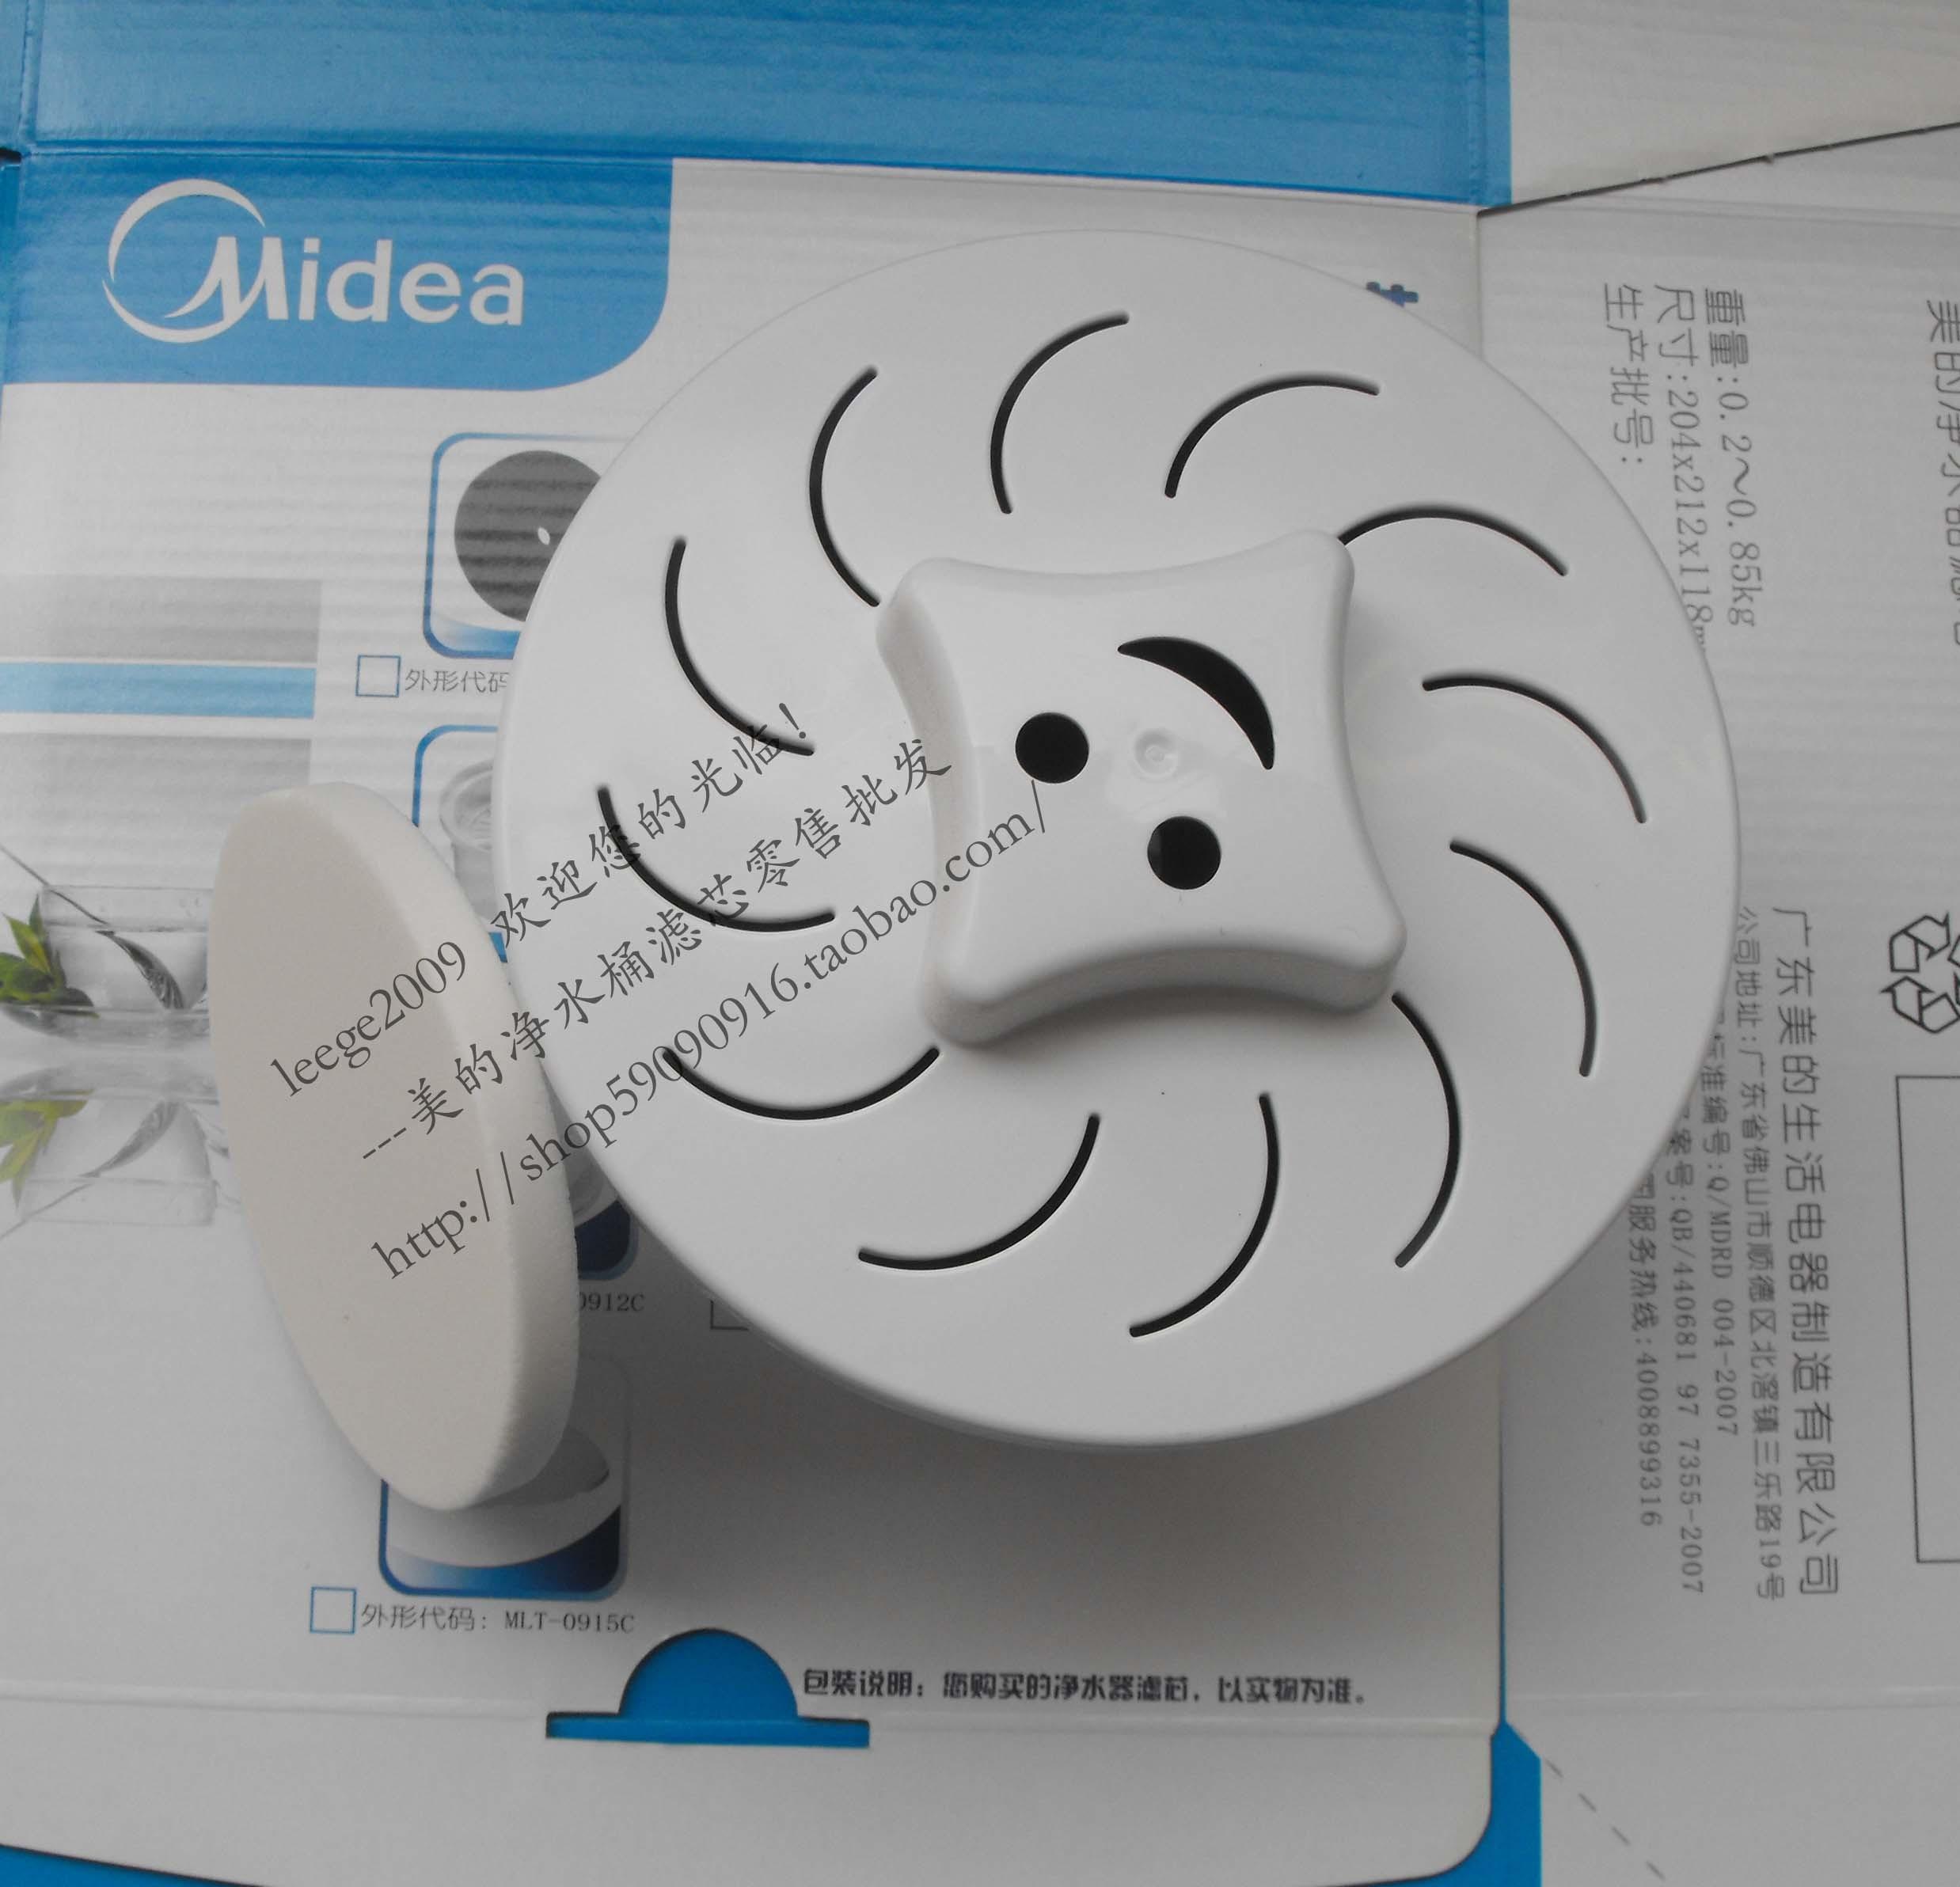 Accesorios de filtro purificador de agua potable MC-3865CB MT-3865CB / elemento de auténtica belleza de la belleza